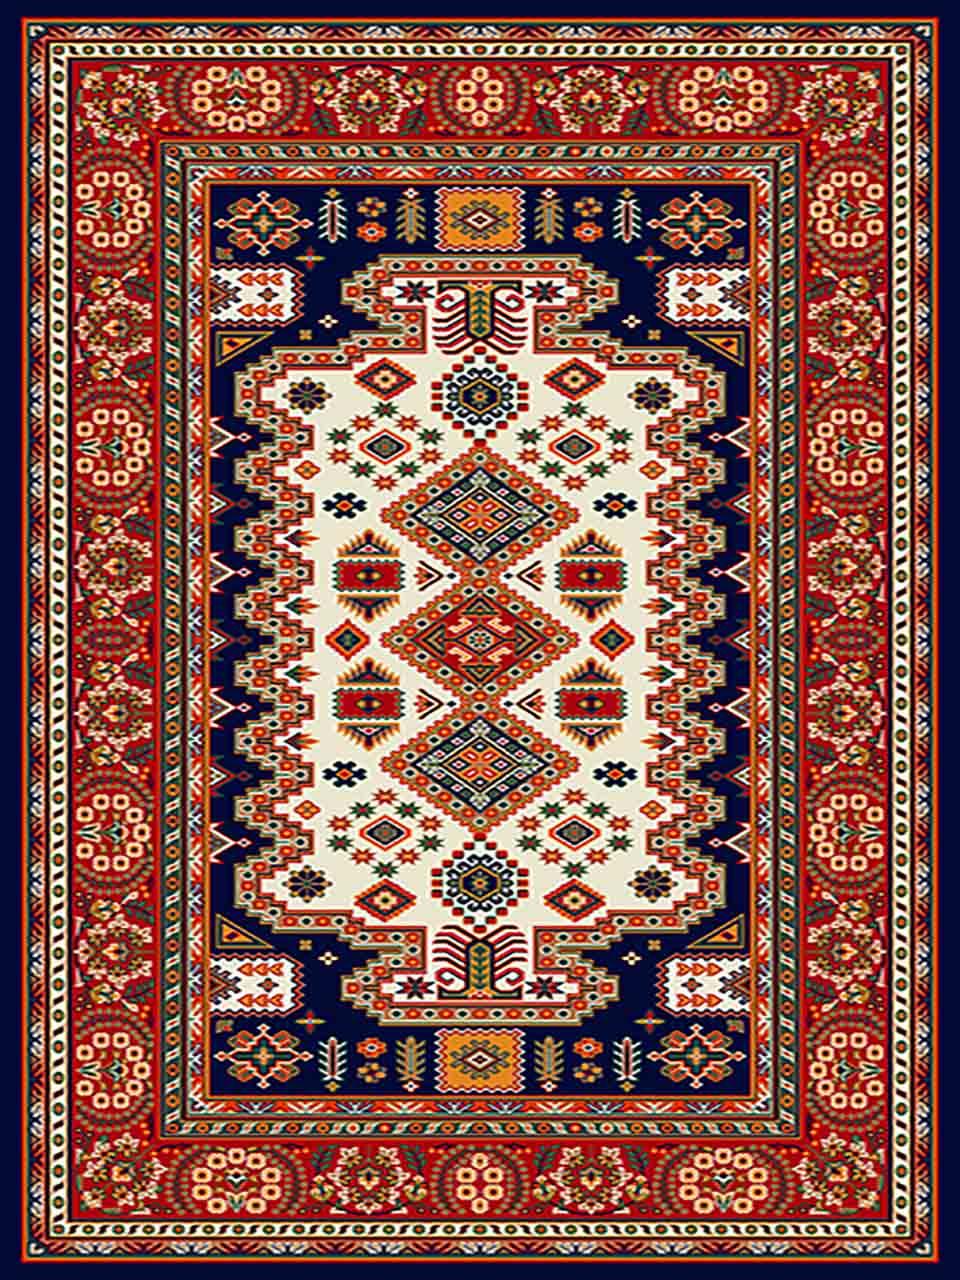 فرش (255) پلی پروپیلن - 8 رنگ - 320 شانه - سورمه ای - تراکم 960